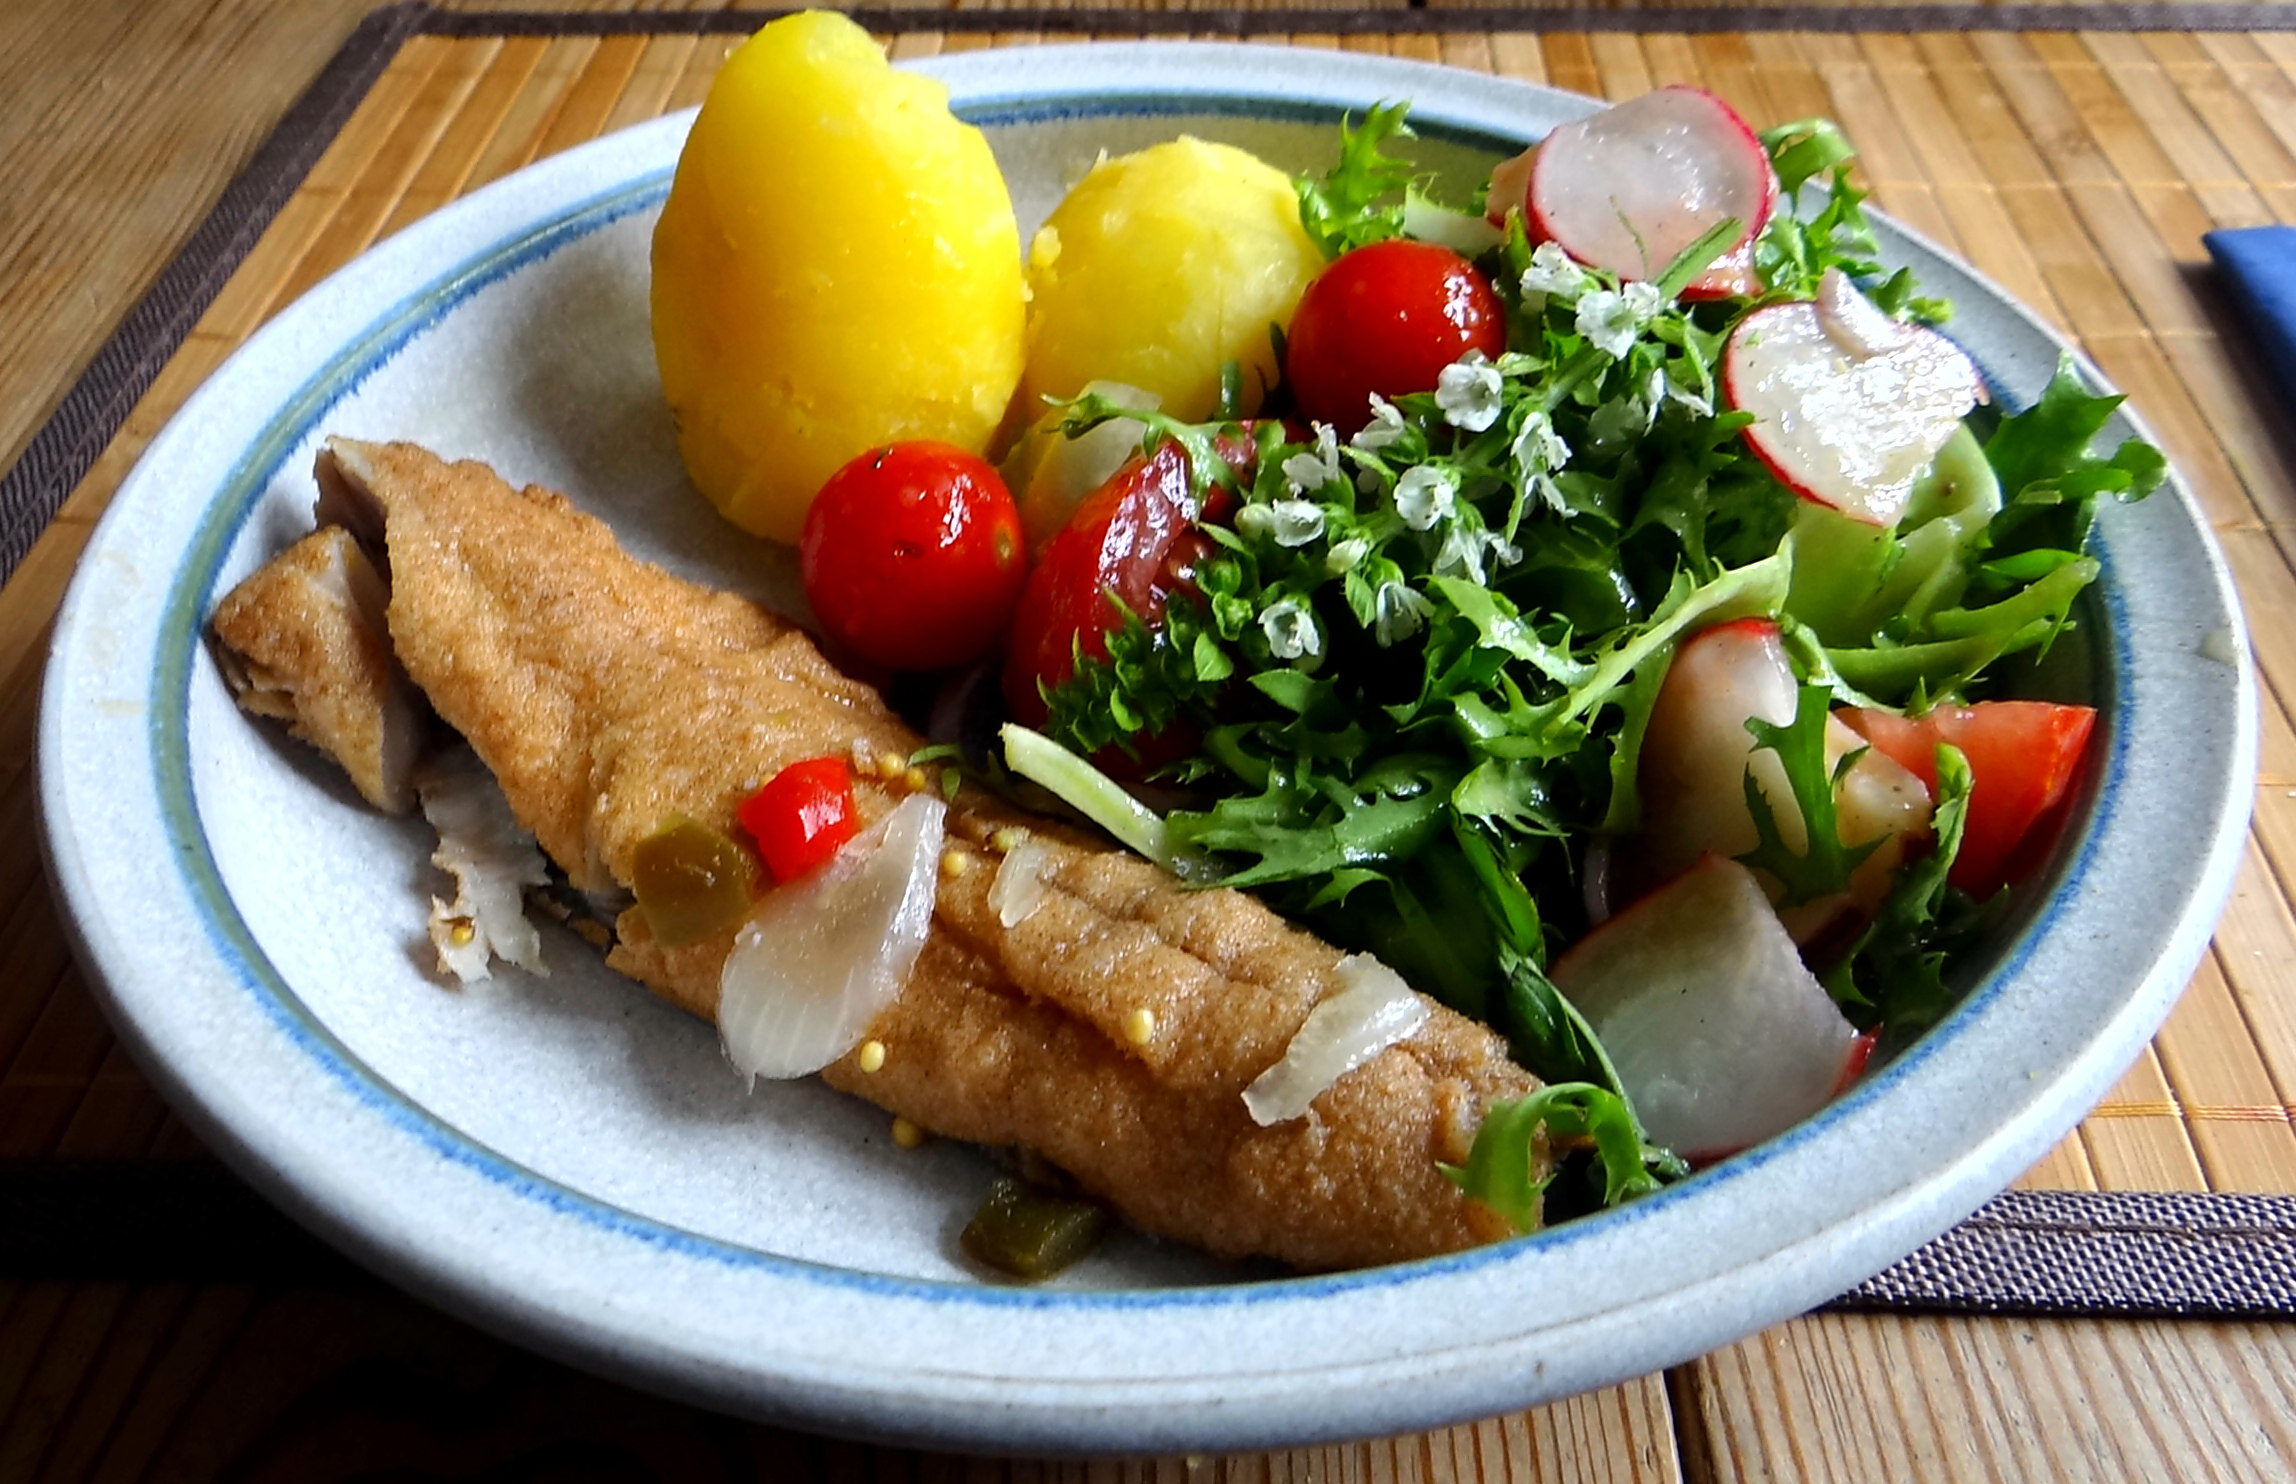 Brathering,Pellkartoffeln,Frisee Salat,Quarkspeise (2)